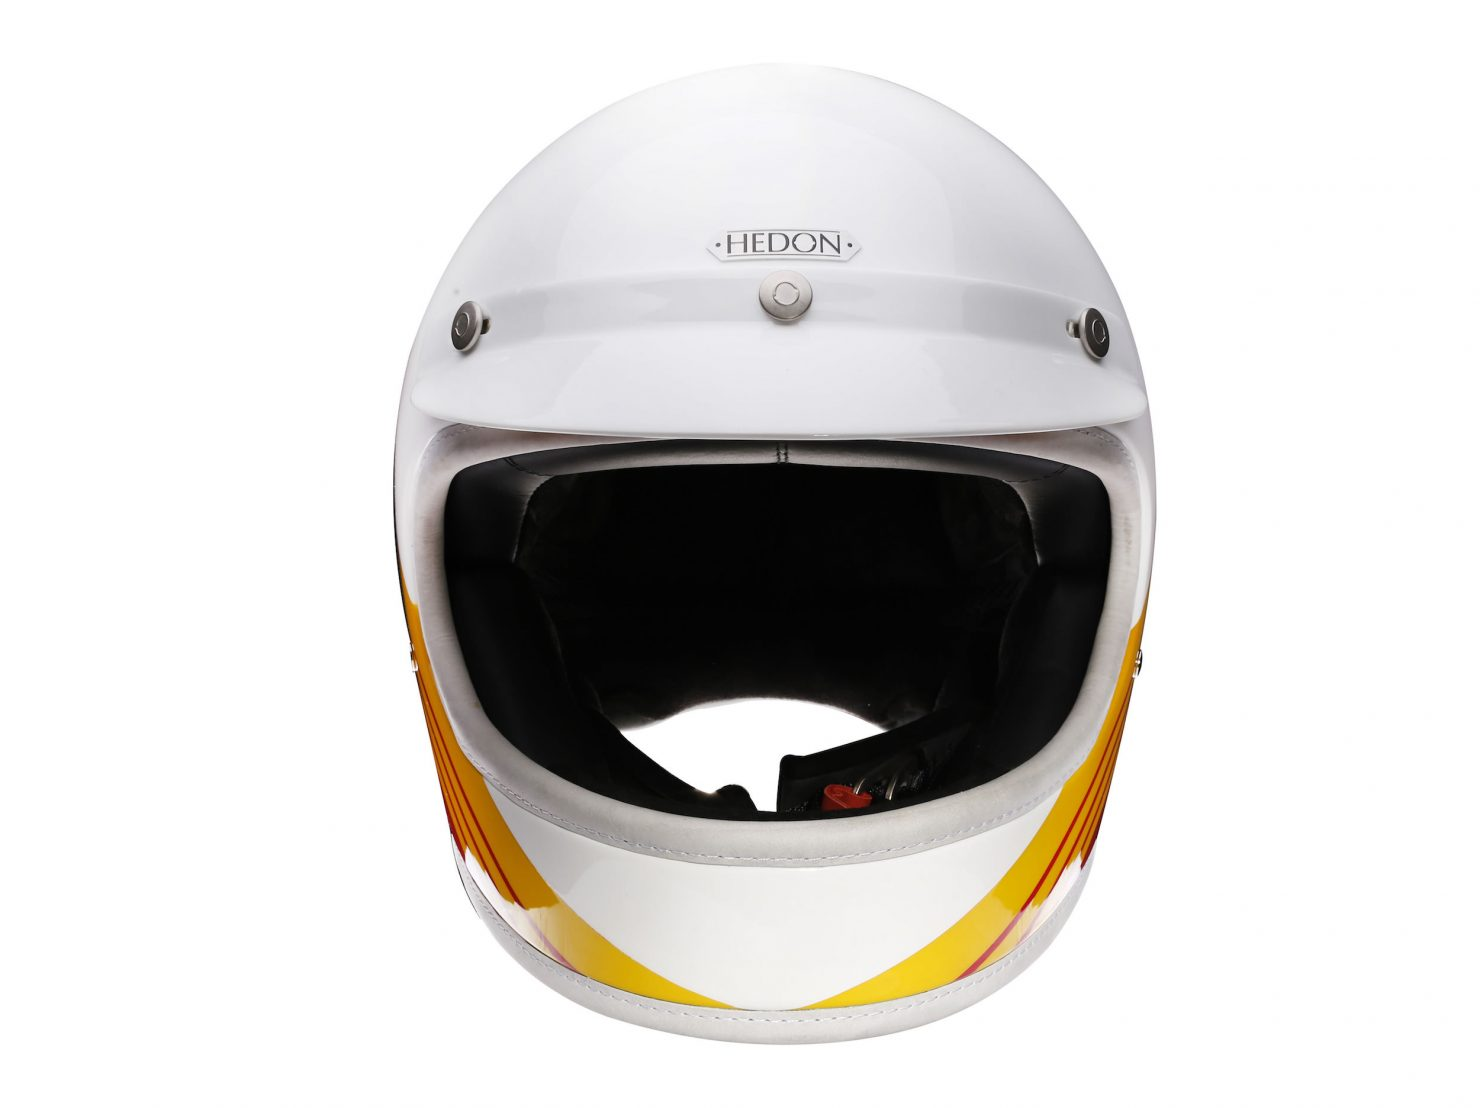 HEDON X DIRTQUAKE FRONT 1480x1108 - Hedon Heroine Dirt Quake Trailblazer Helmet